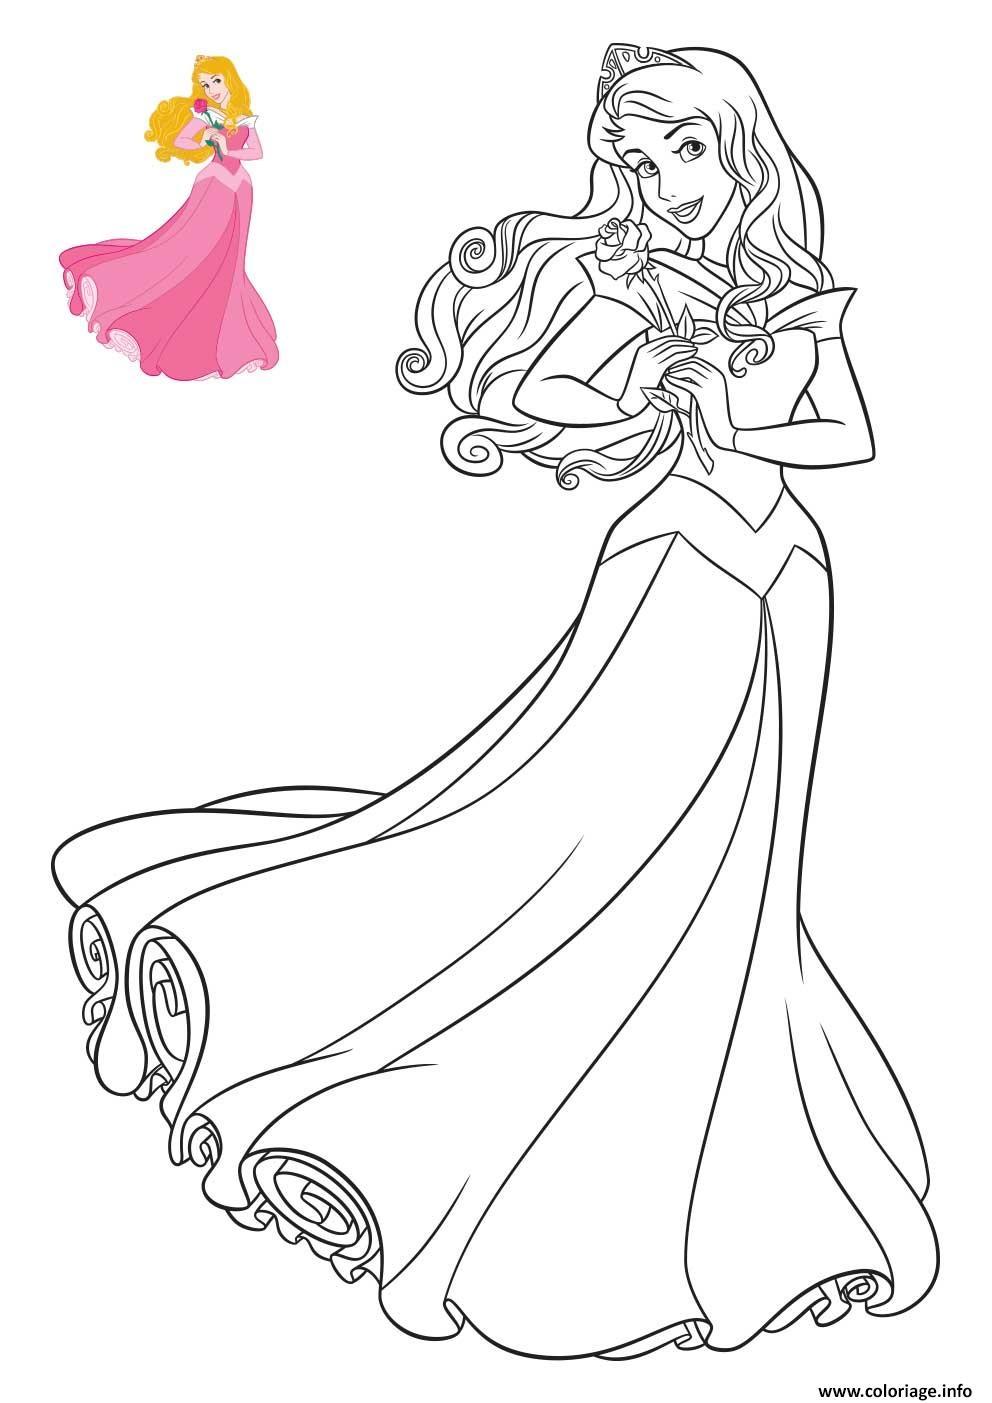 Coloriage Princesse Disney Aurore Dessin Princesse Disney A Imprimer